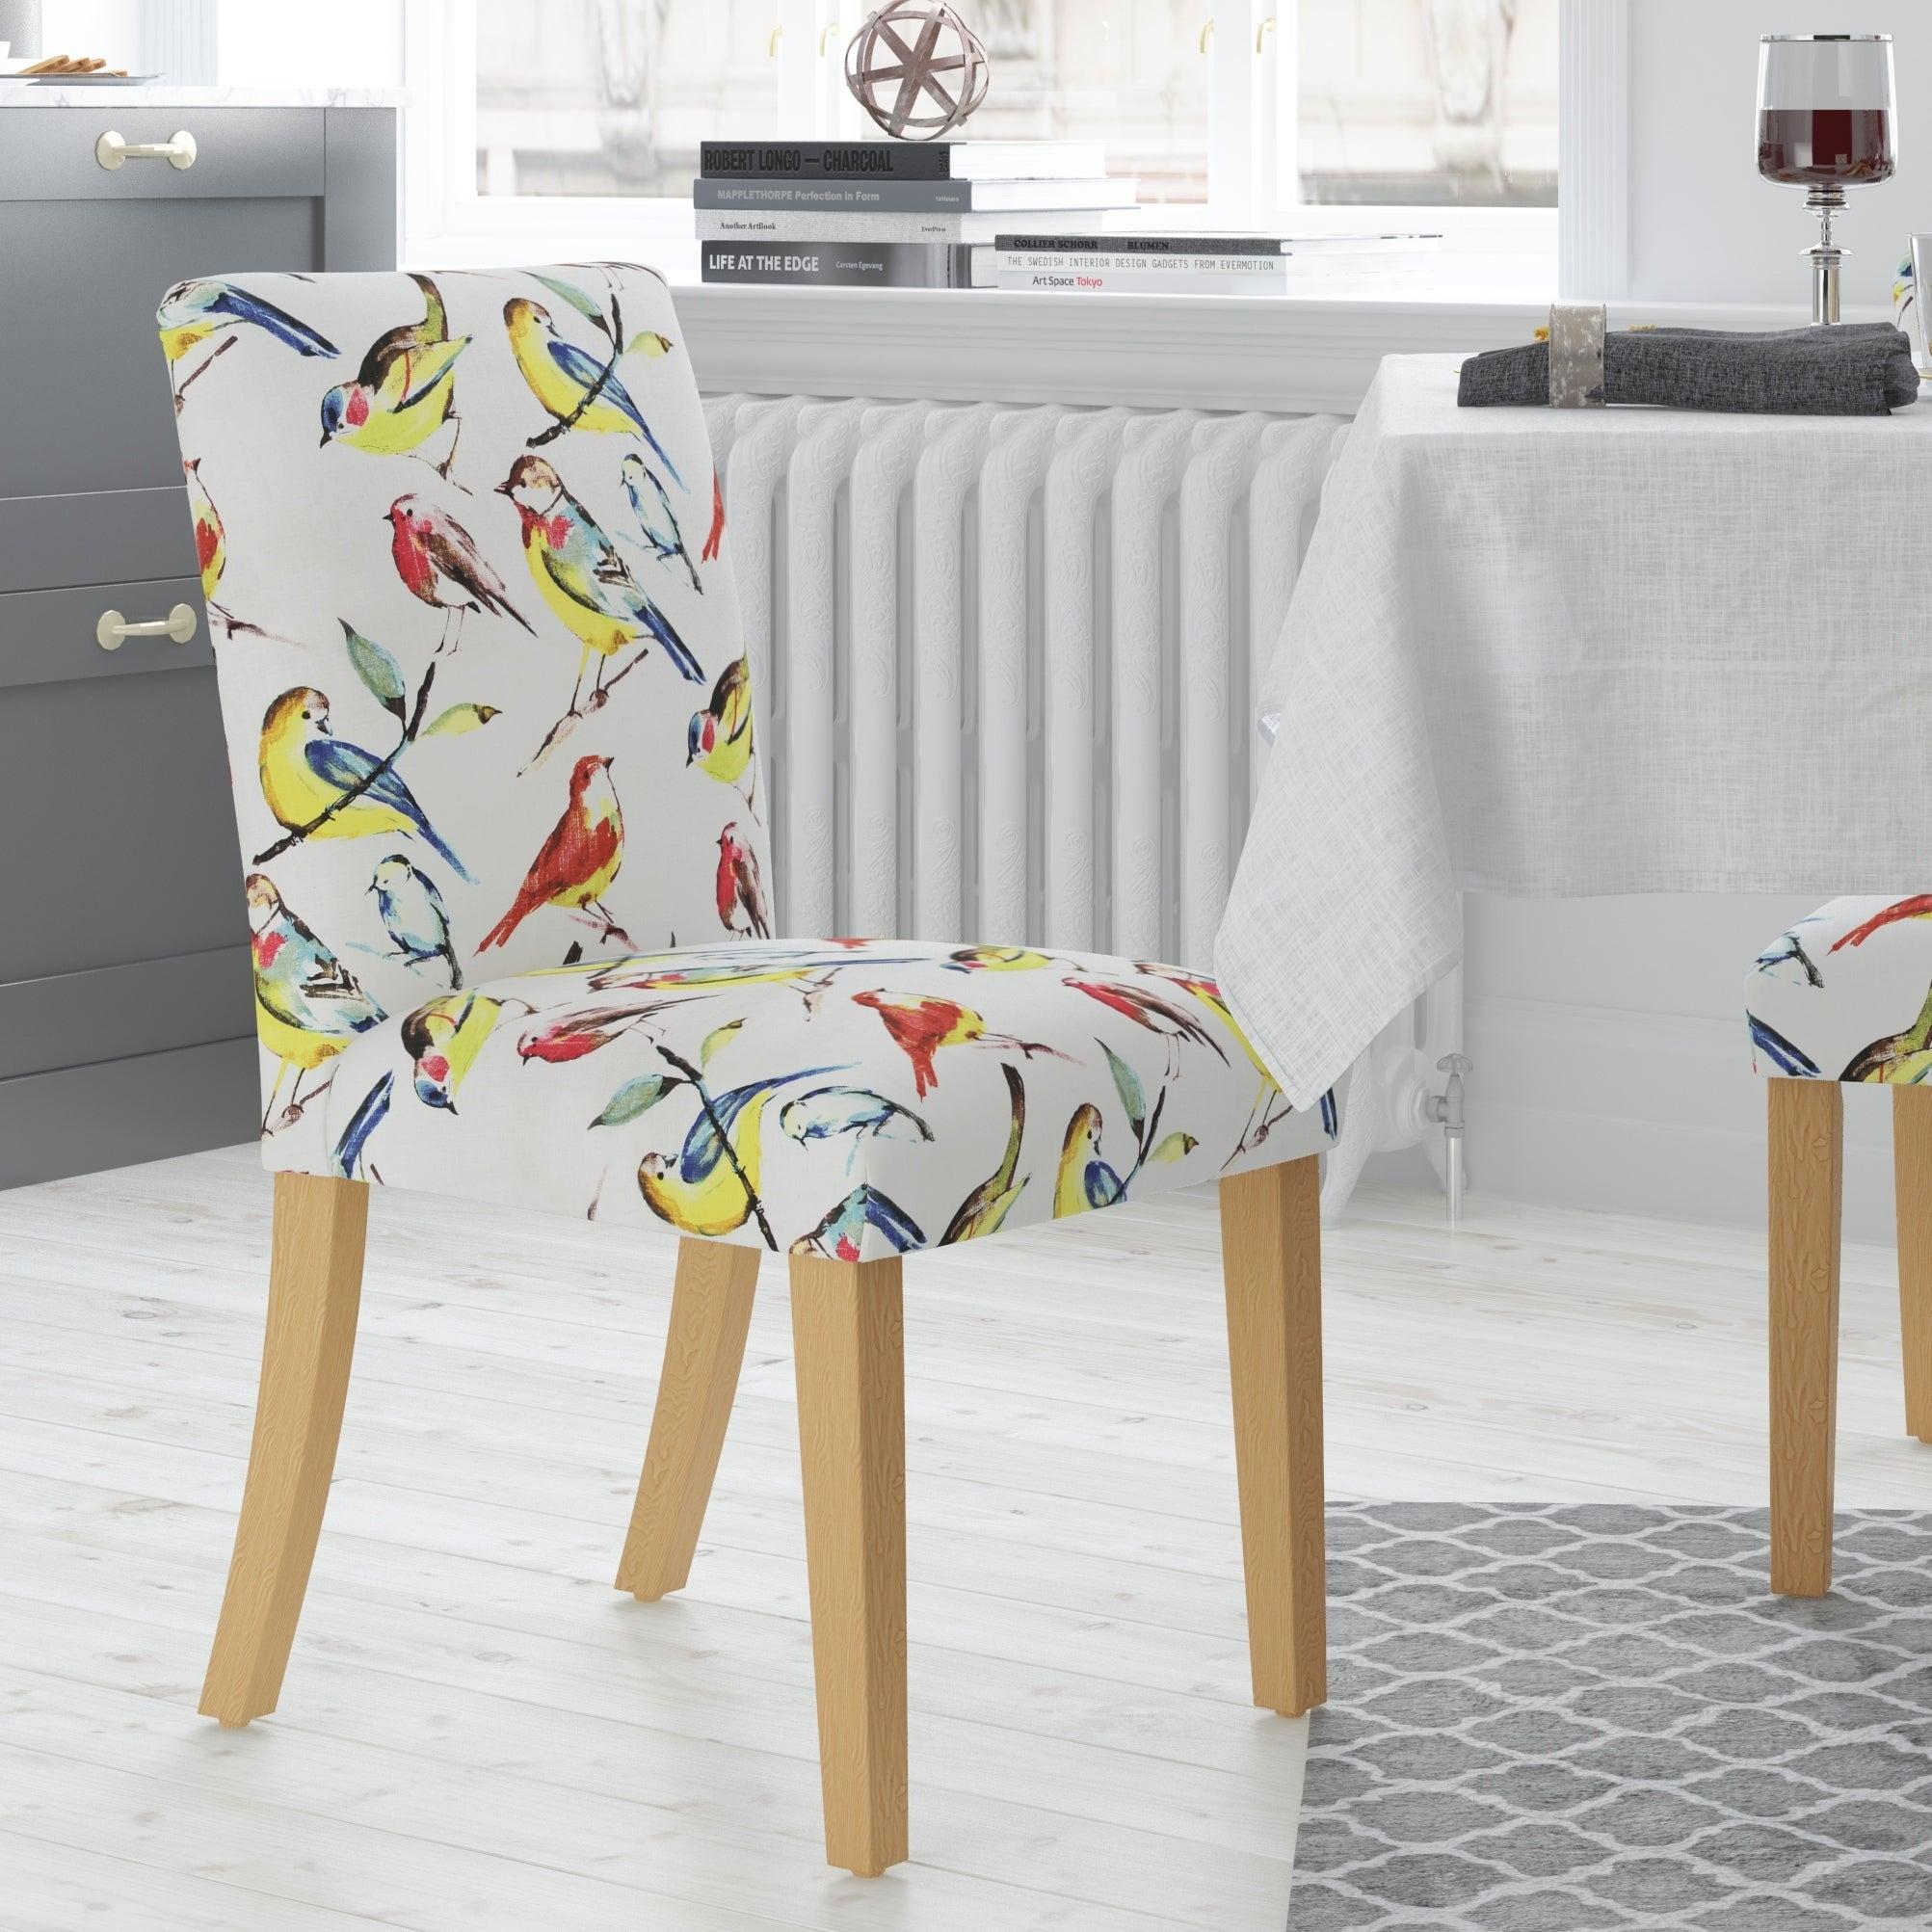 Skyline Furniture Bird Watcher Summer Multicolor Upholste...